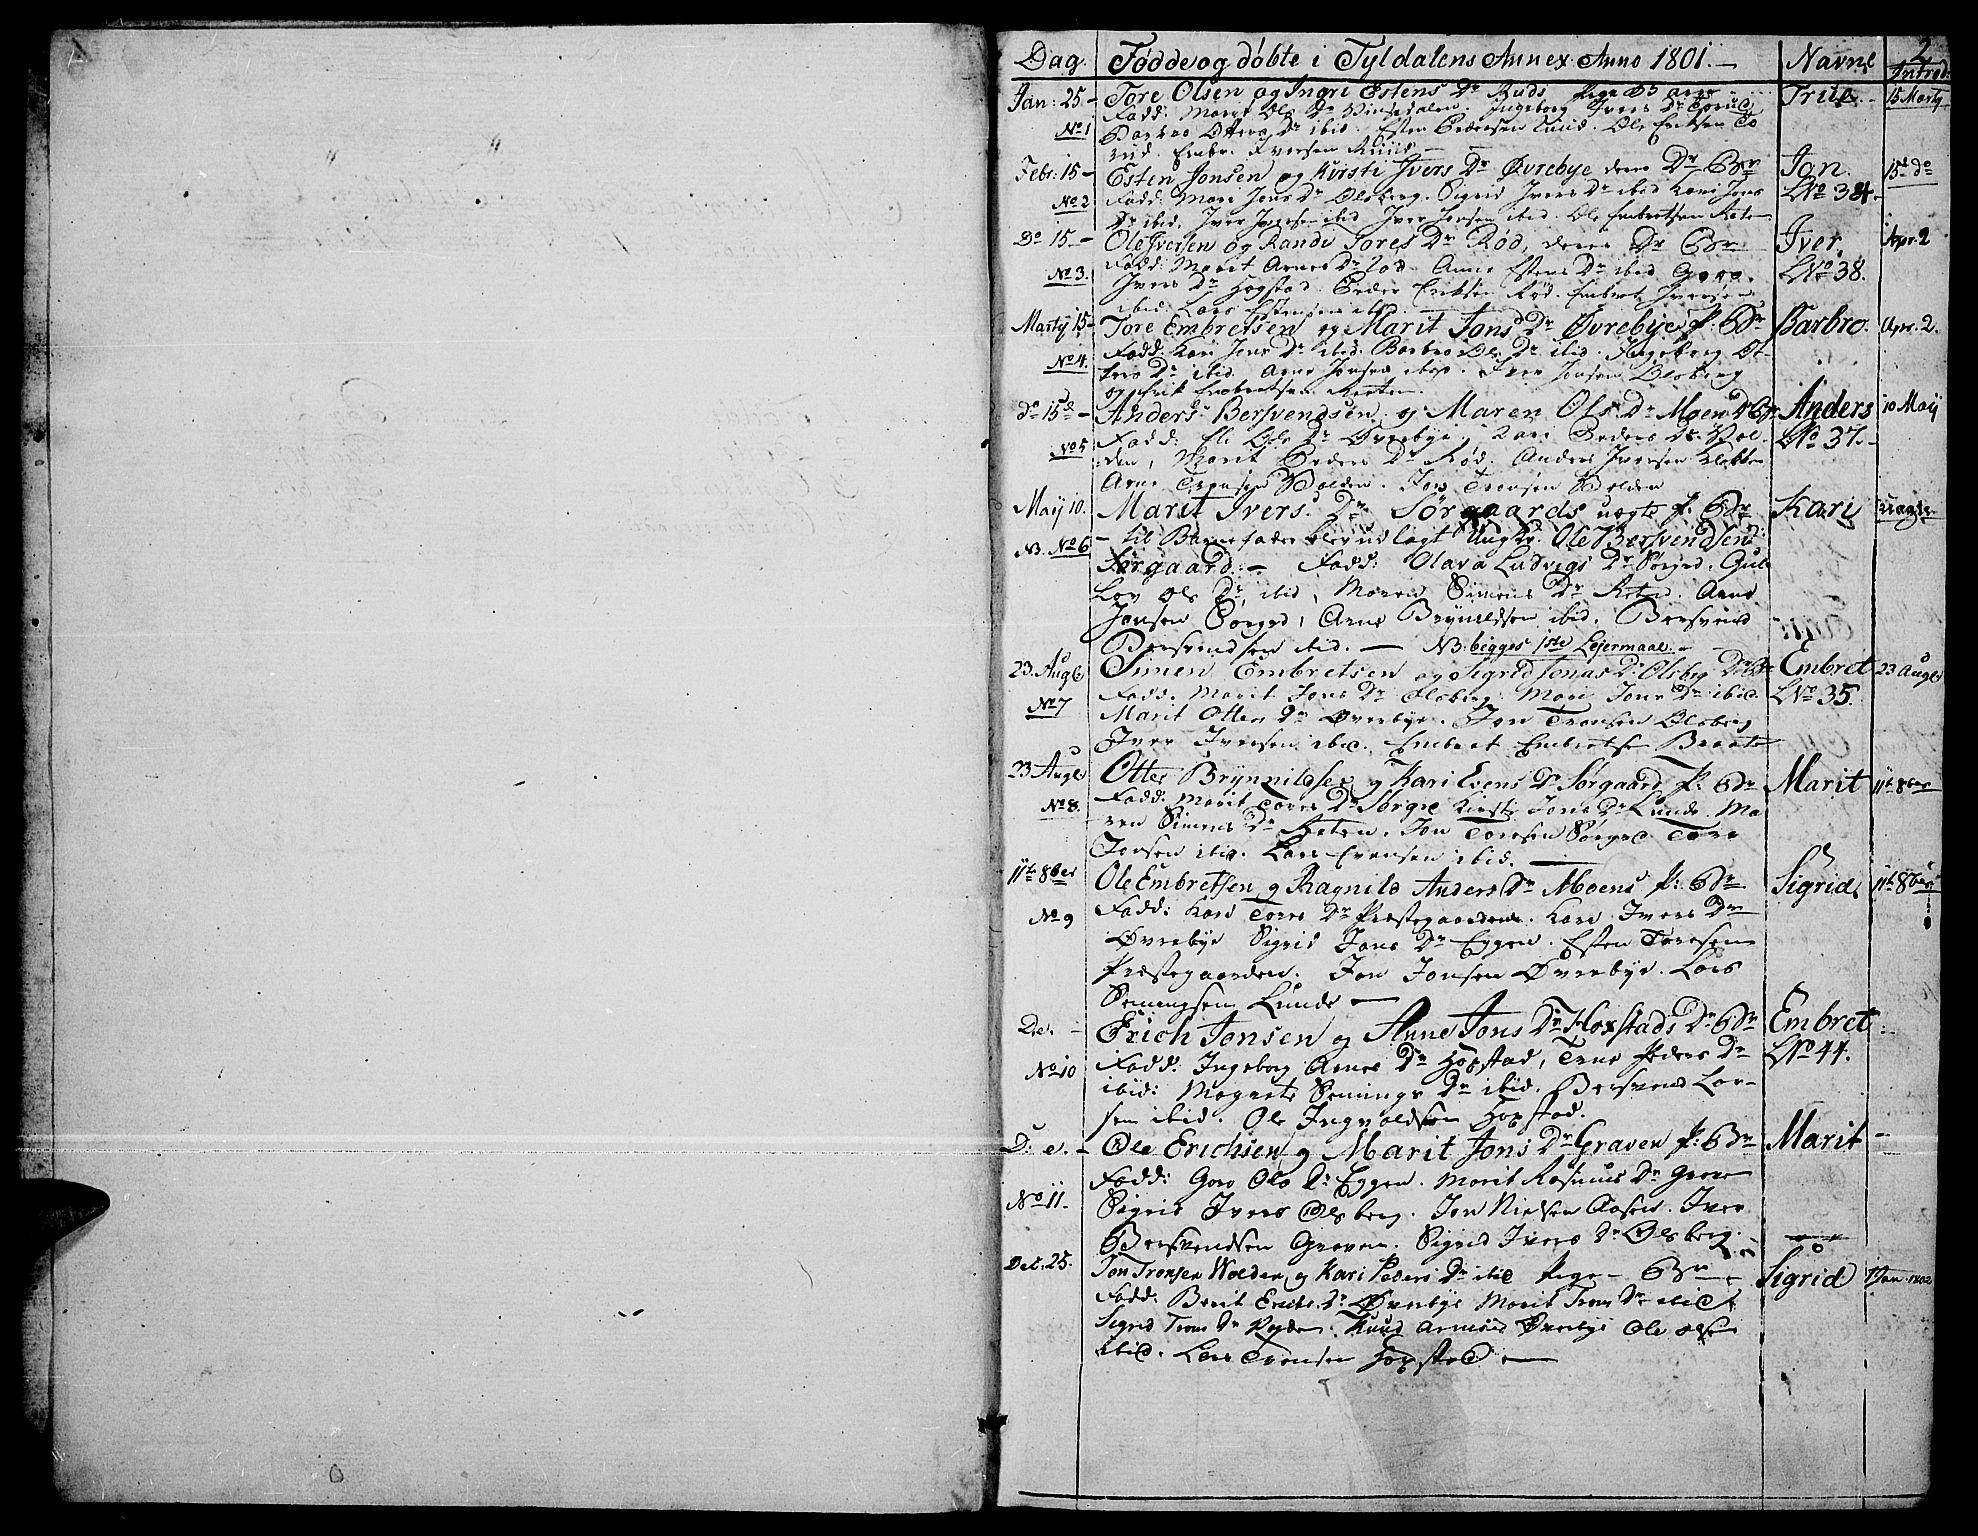 SAH, Tynset prestekontor, Ministerialbok nr. 17, 1801-1814, s. 2